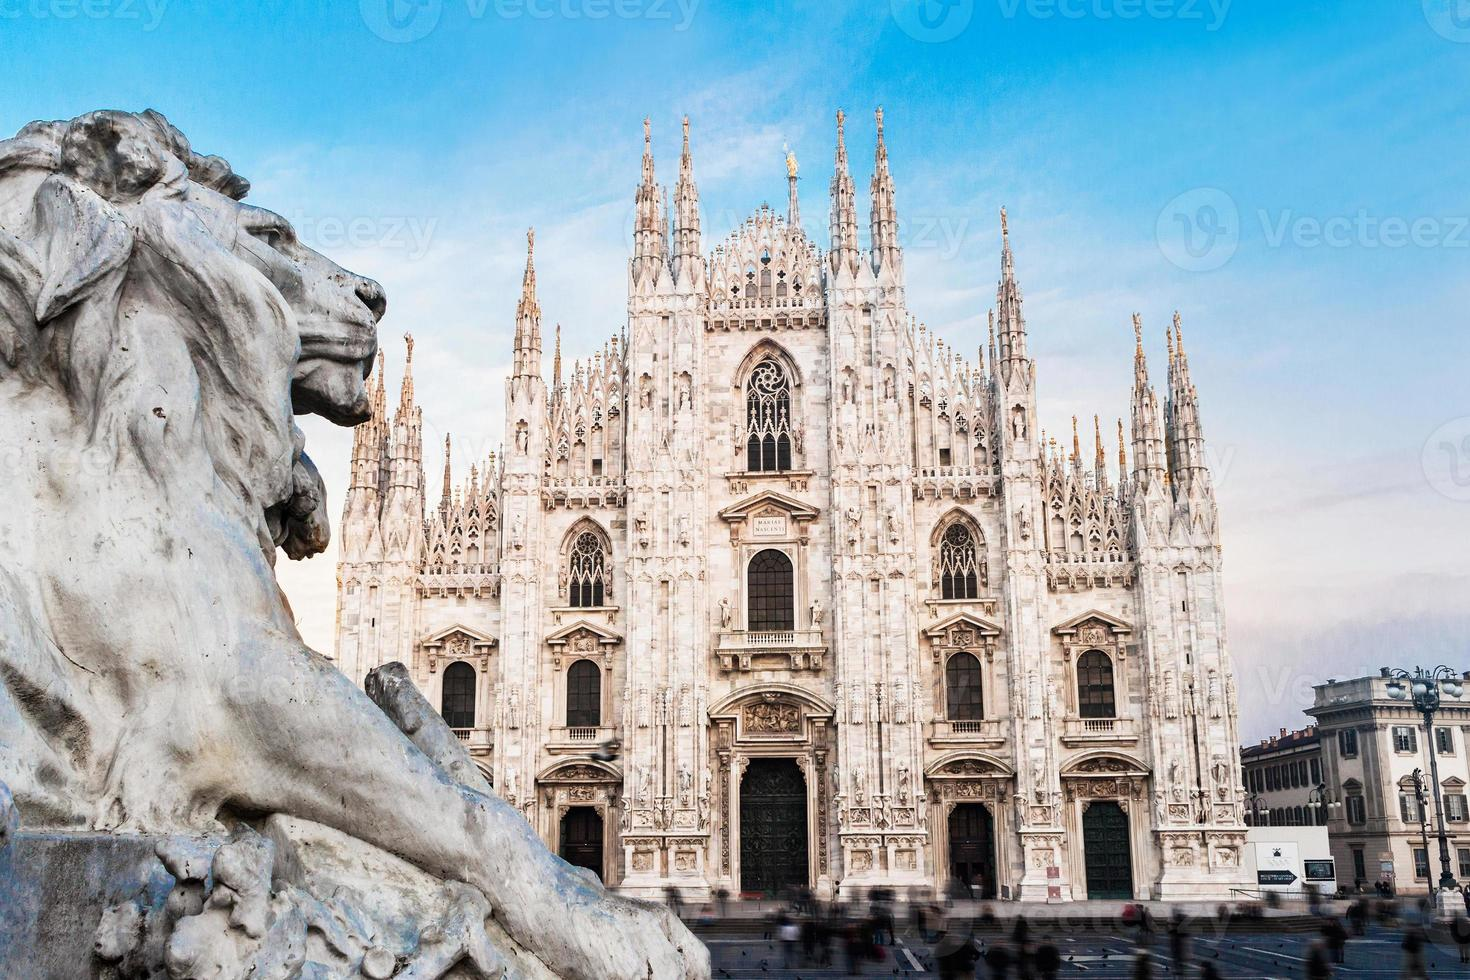 cathédrale duomo de milan, italie. regarder de la statue de lion photo